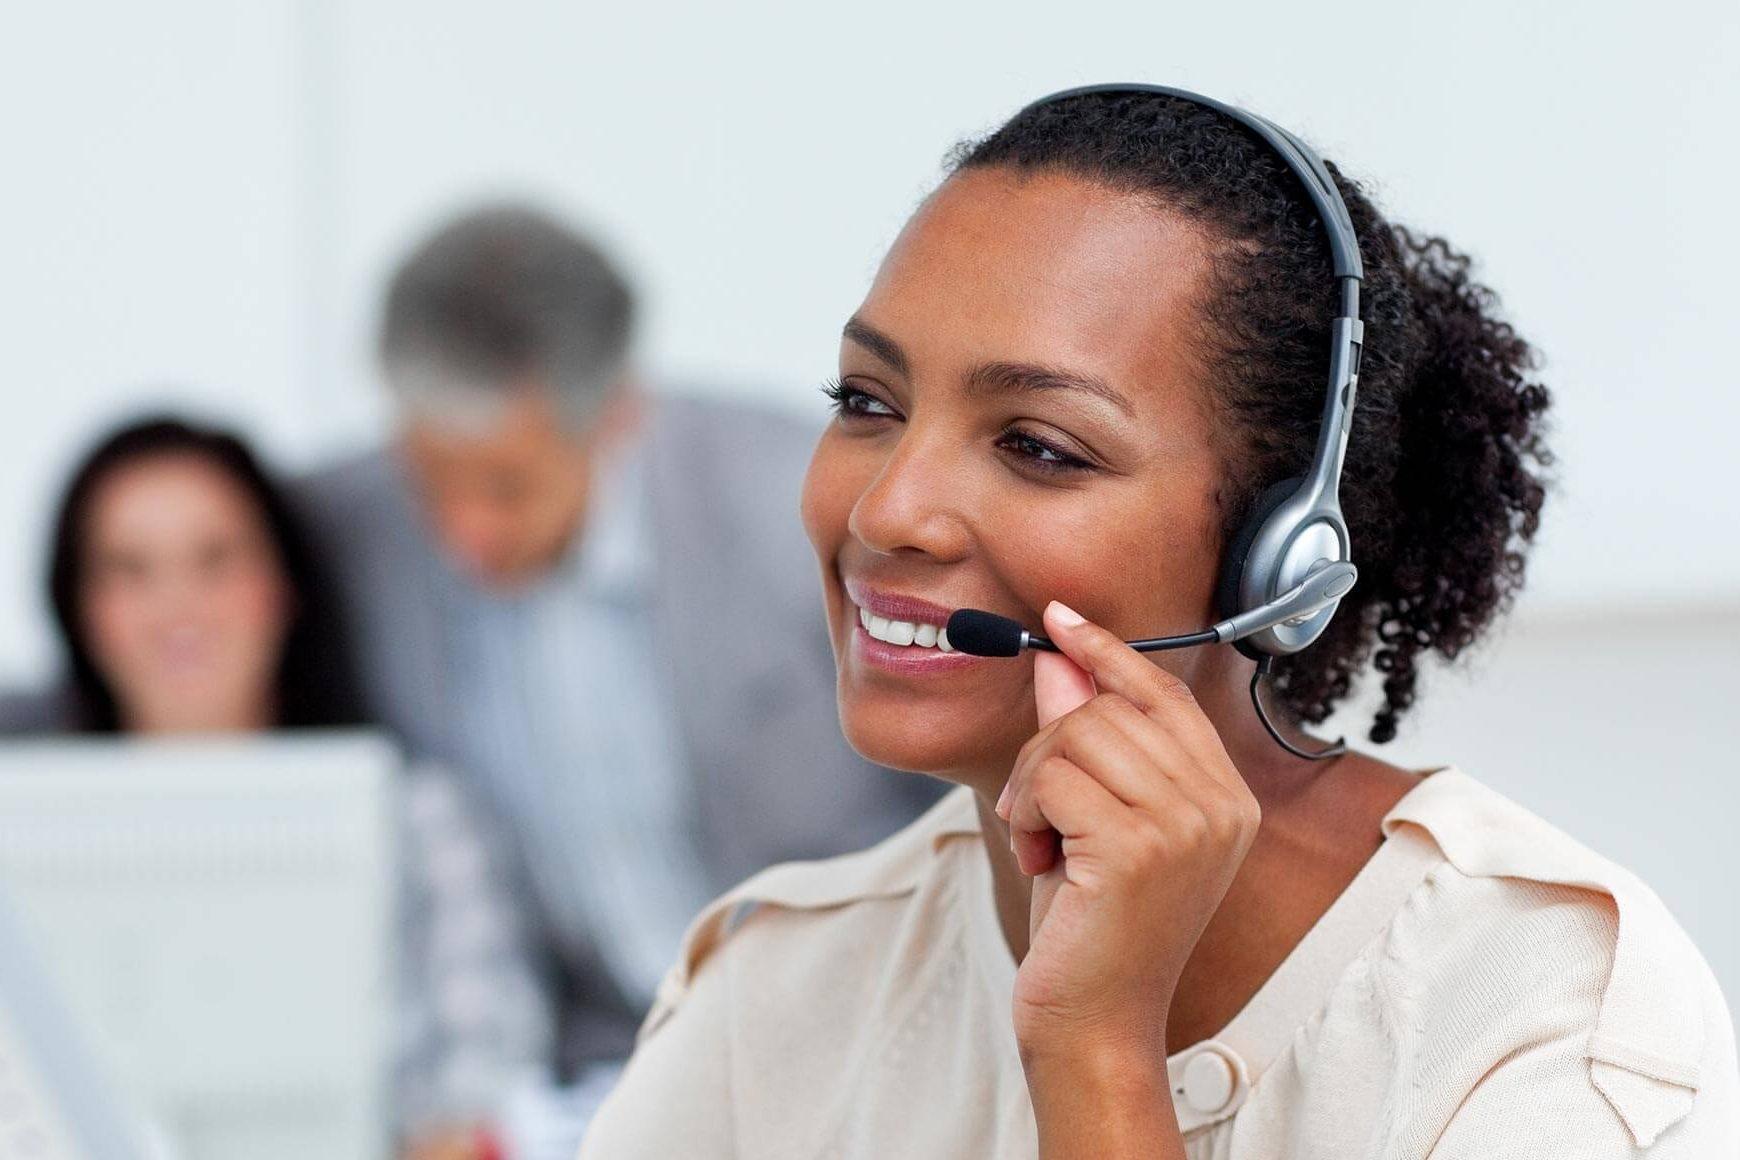 hero-image-14-techniques-to-provide-amazing-call-center-customer-service-1740x1160